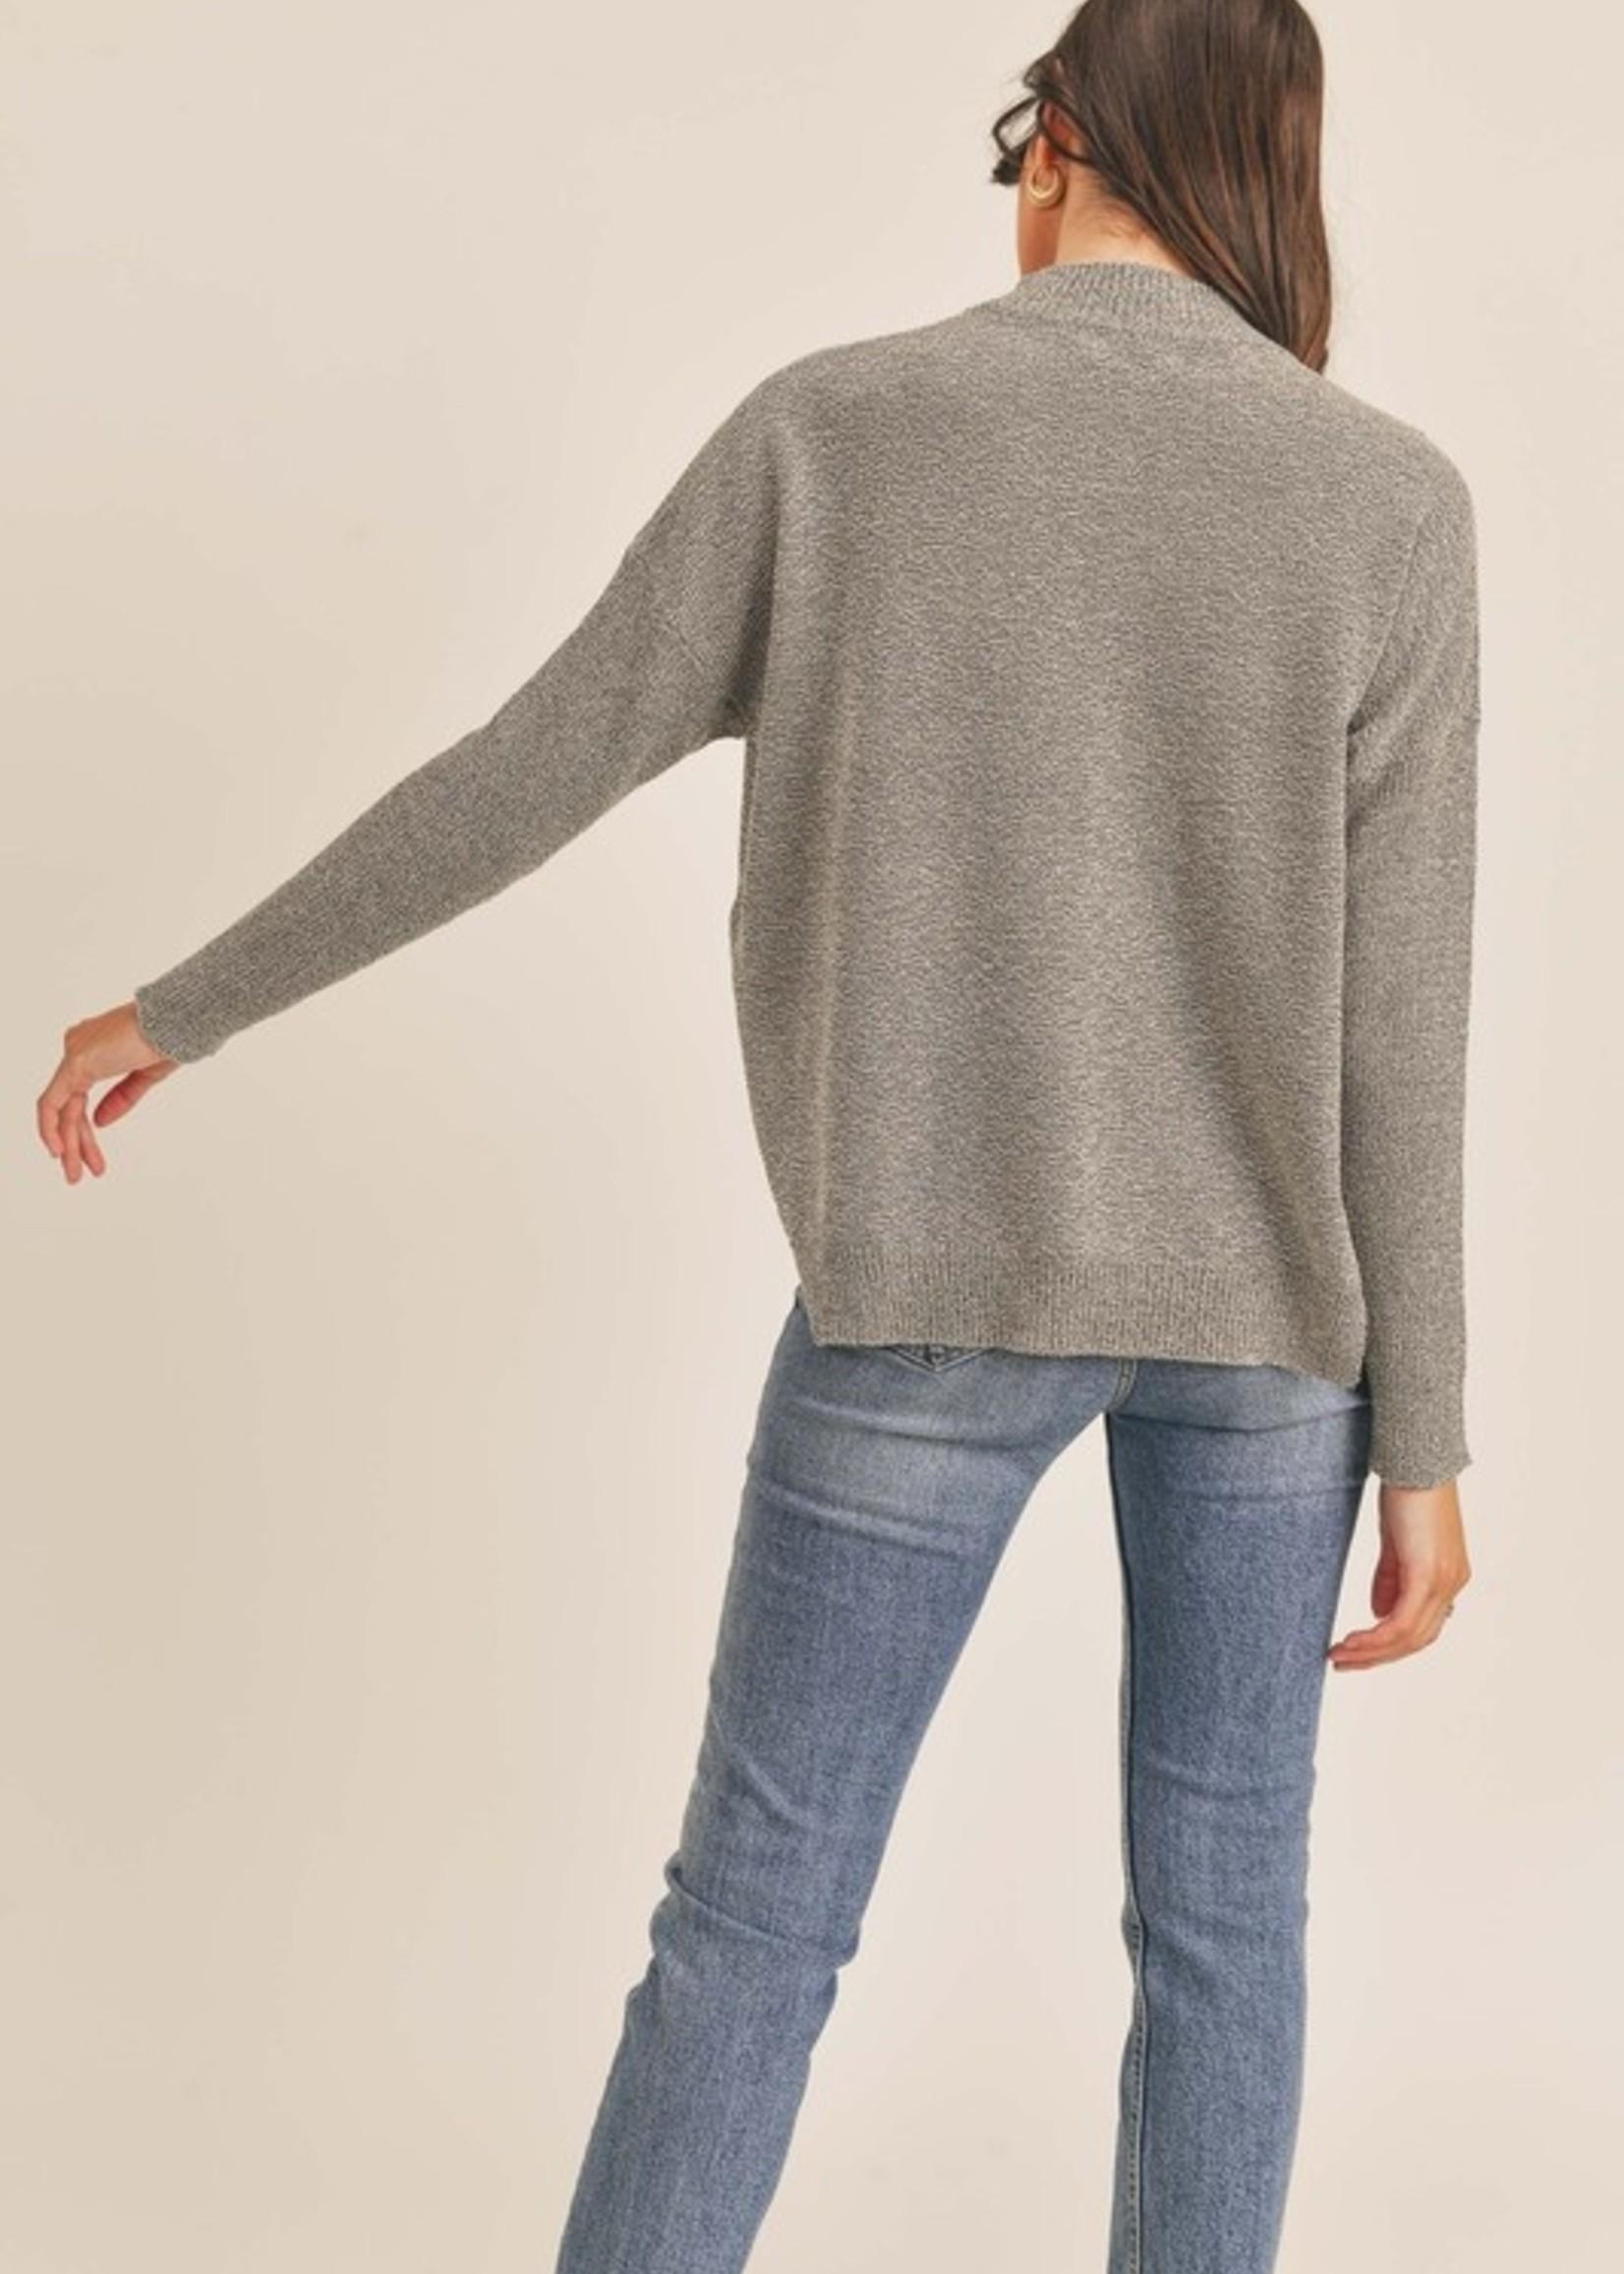 Lush Mockneck Pullover Sweater - Heather Grey